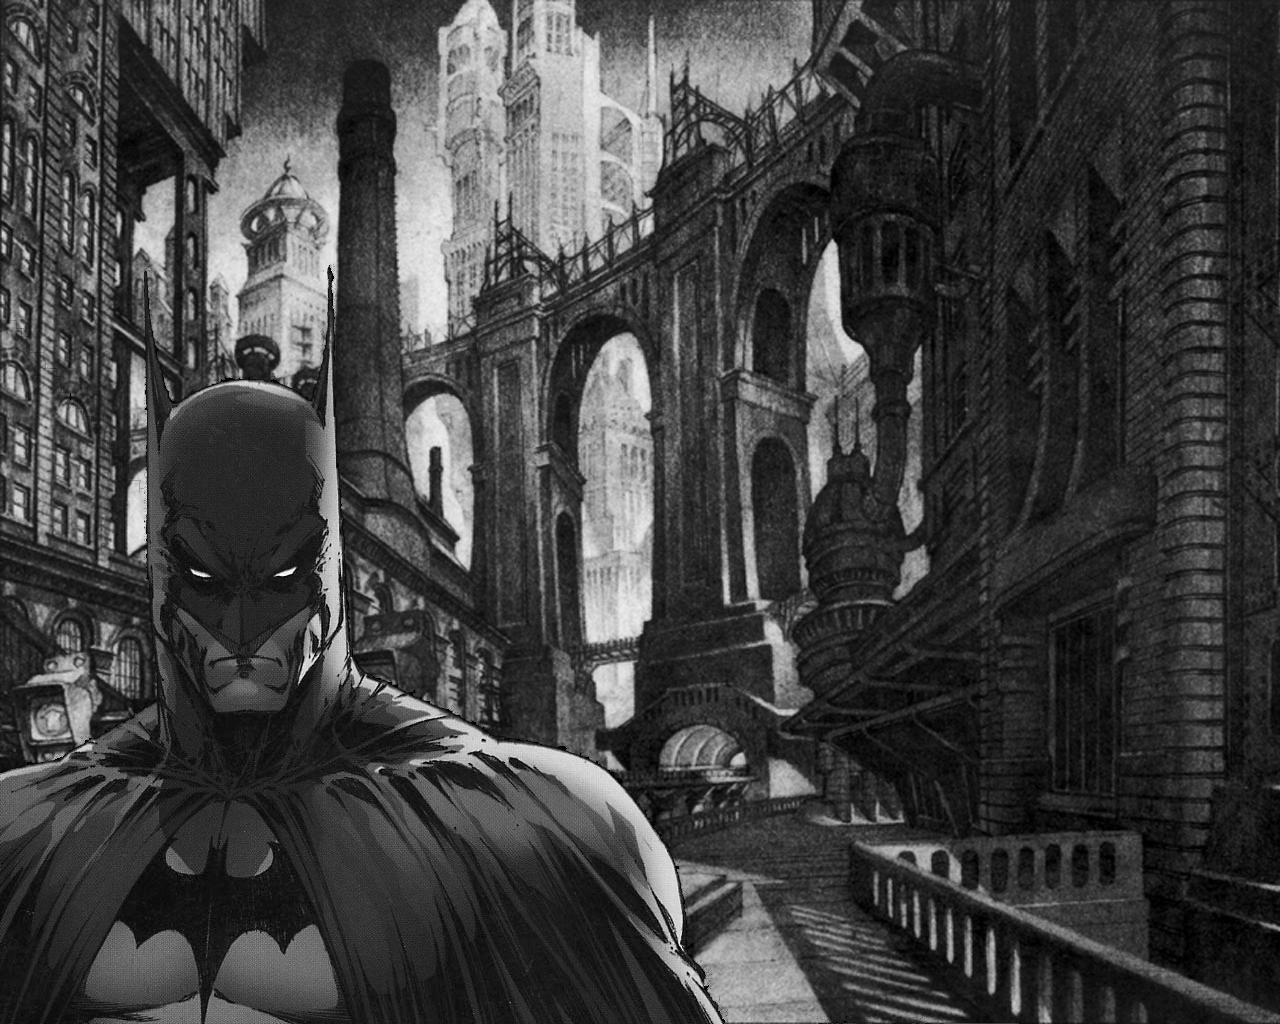 ELIGE TU SUPER-HEROE DE COMIC FAVORITO. Batman%20Wallpaper